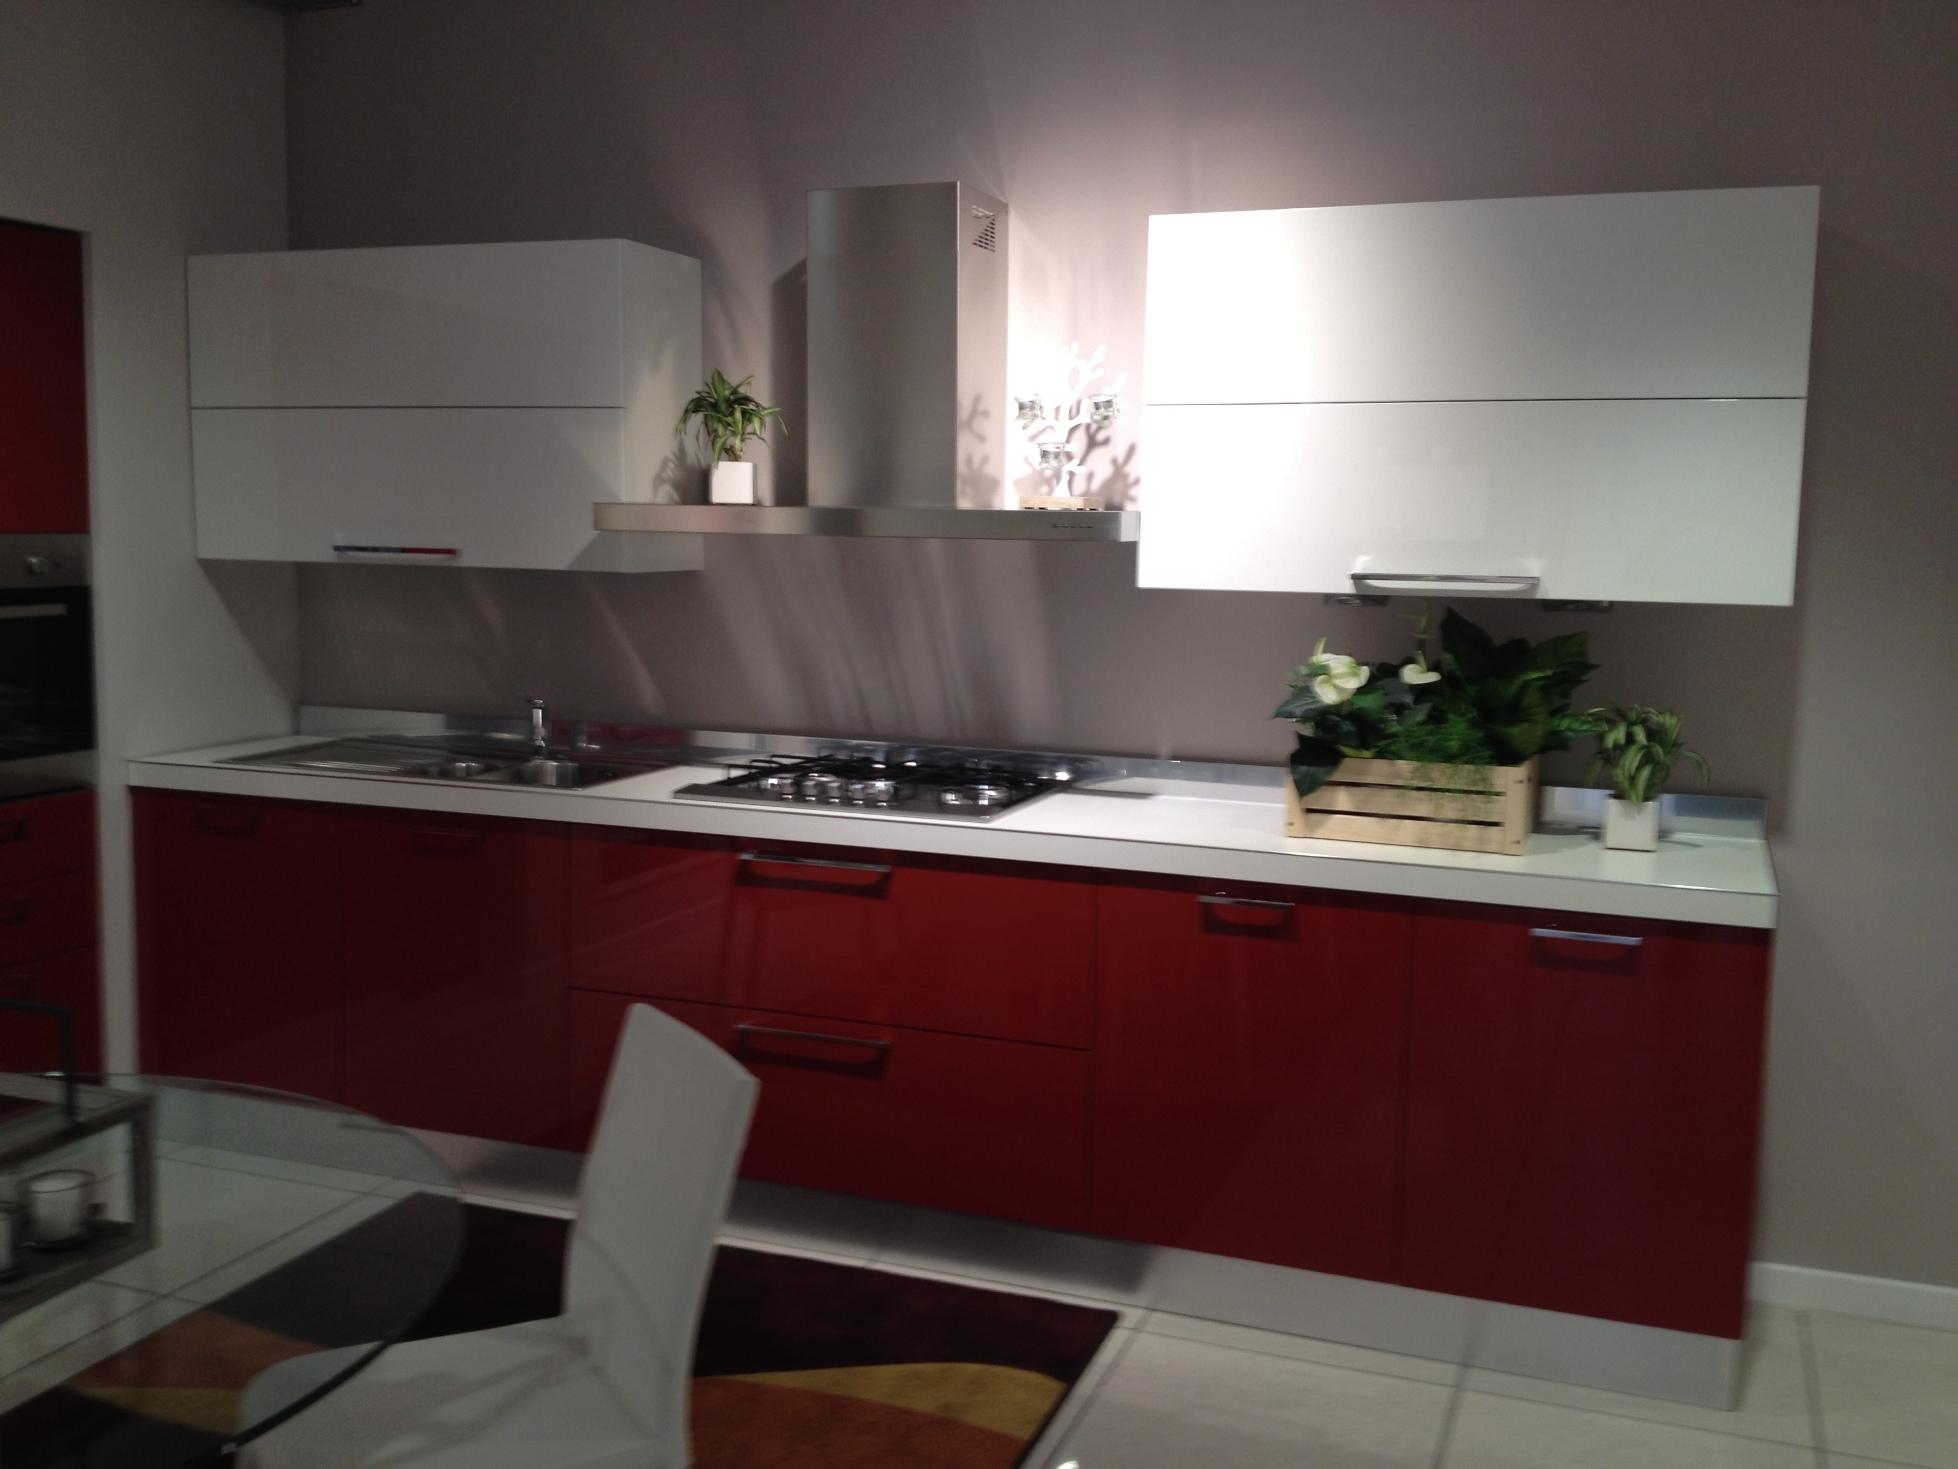 Scavolini cucina sax moderna laccato lucido rossa cucine - Cucina moderna rossa ...